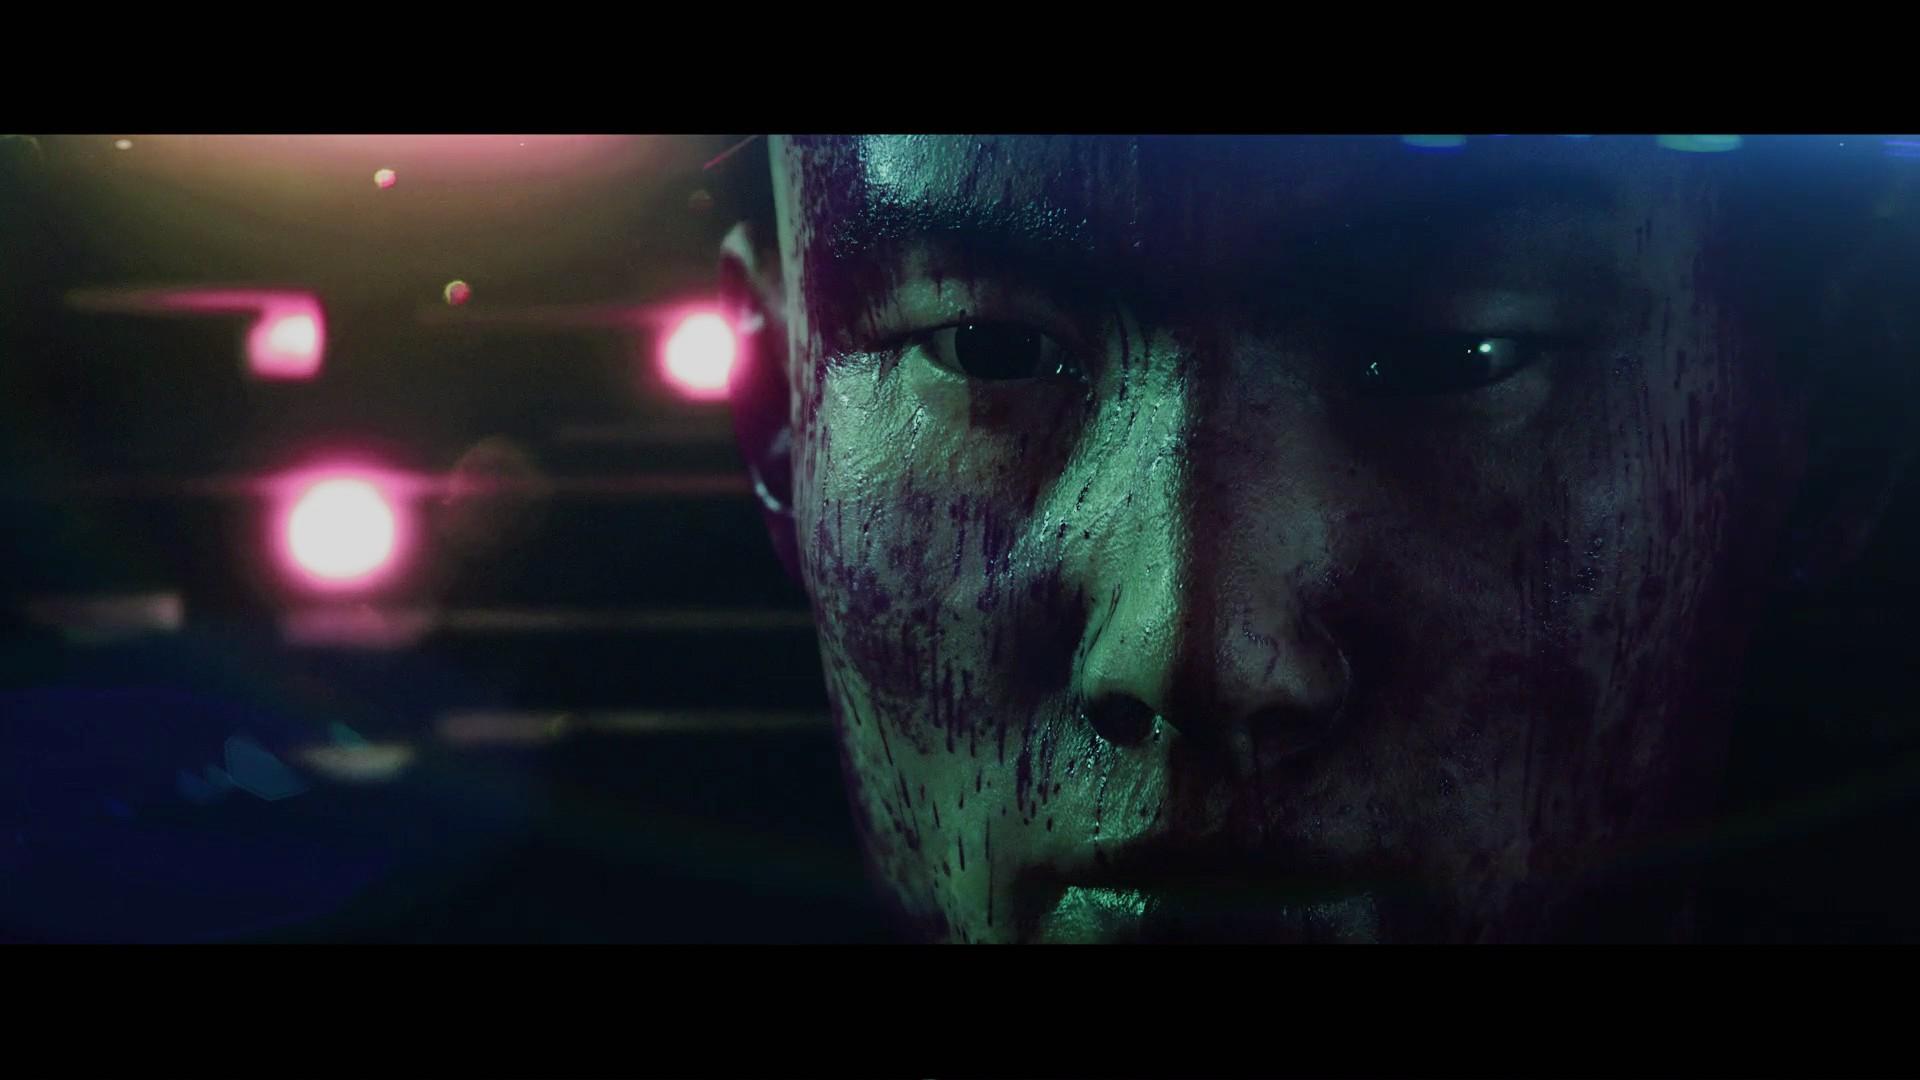 Review - The Hong Kong Massacre